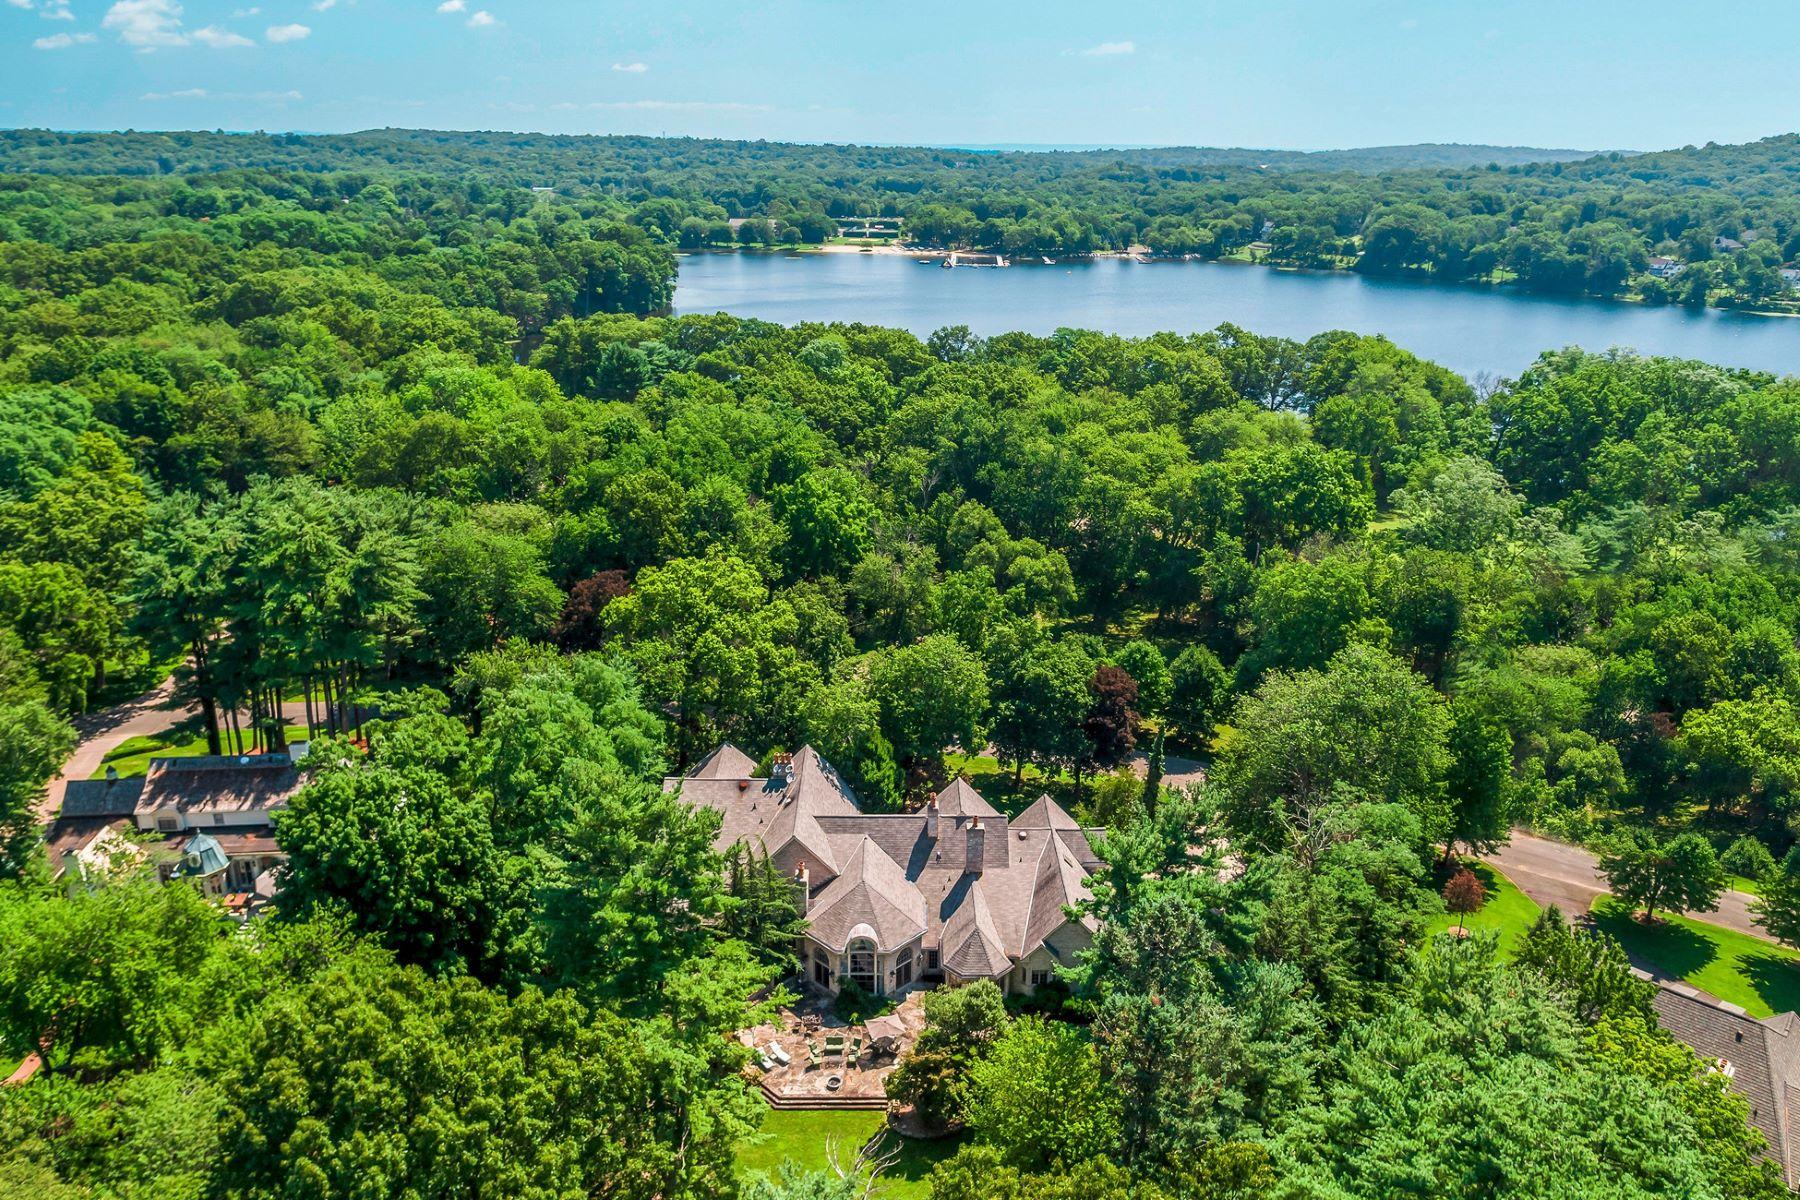 独户住宅 为 销售 在 Majestic Brick Manor 320 Algonquin Road 富兰克林湖, 07417 美国